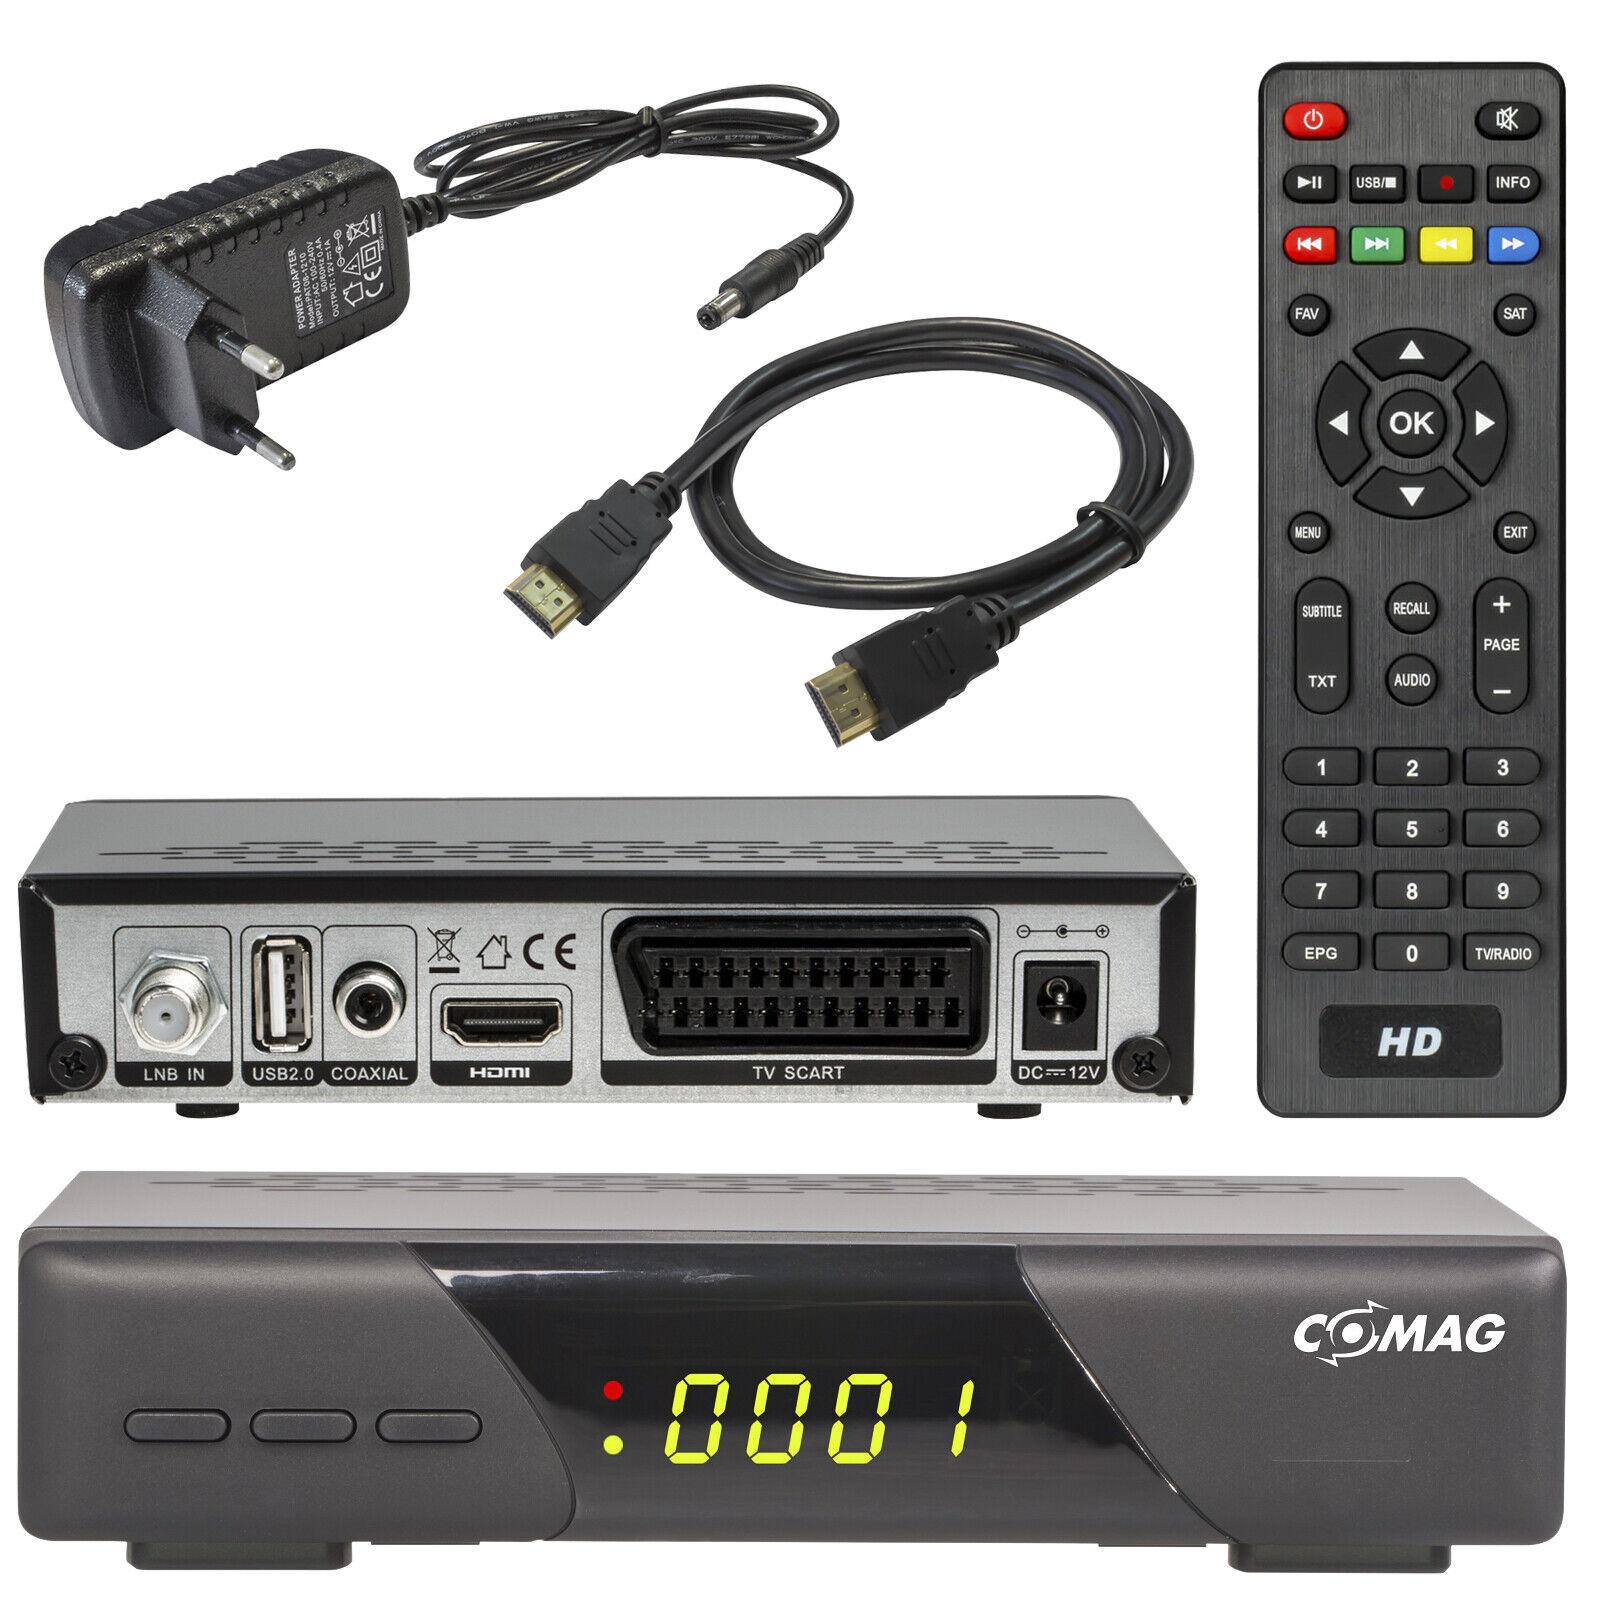 COMAG HD200 Digital HD SAT Receiver mit HDMI Scart DVB-S2 USB Mediaplayer 1080p